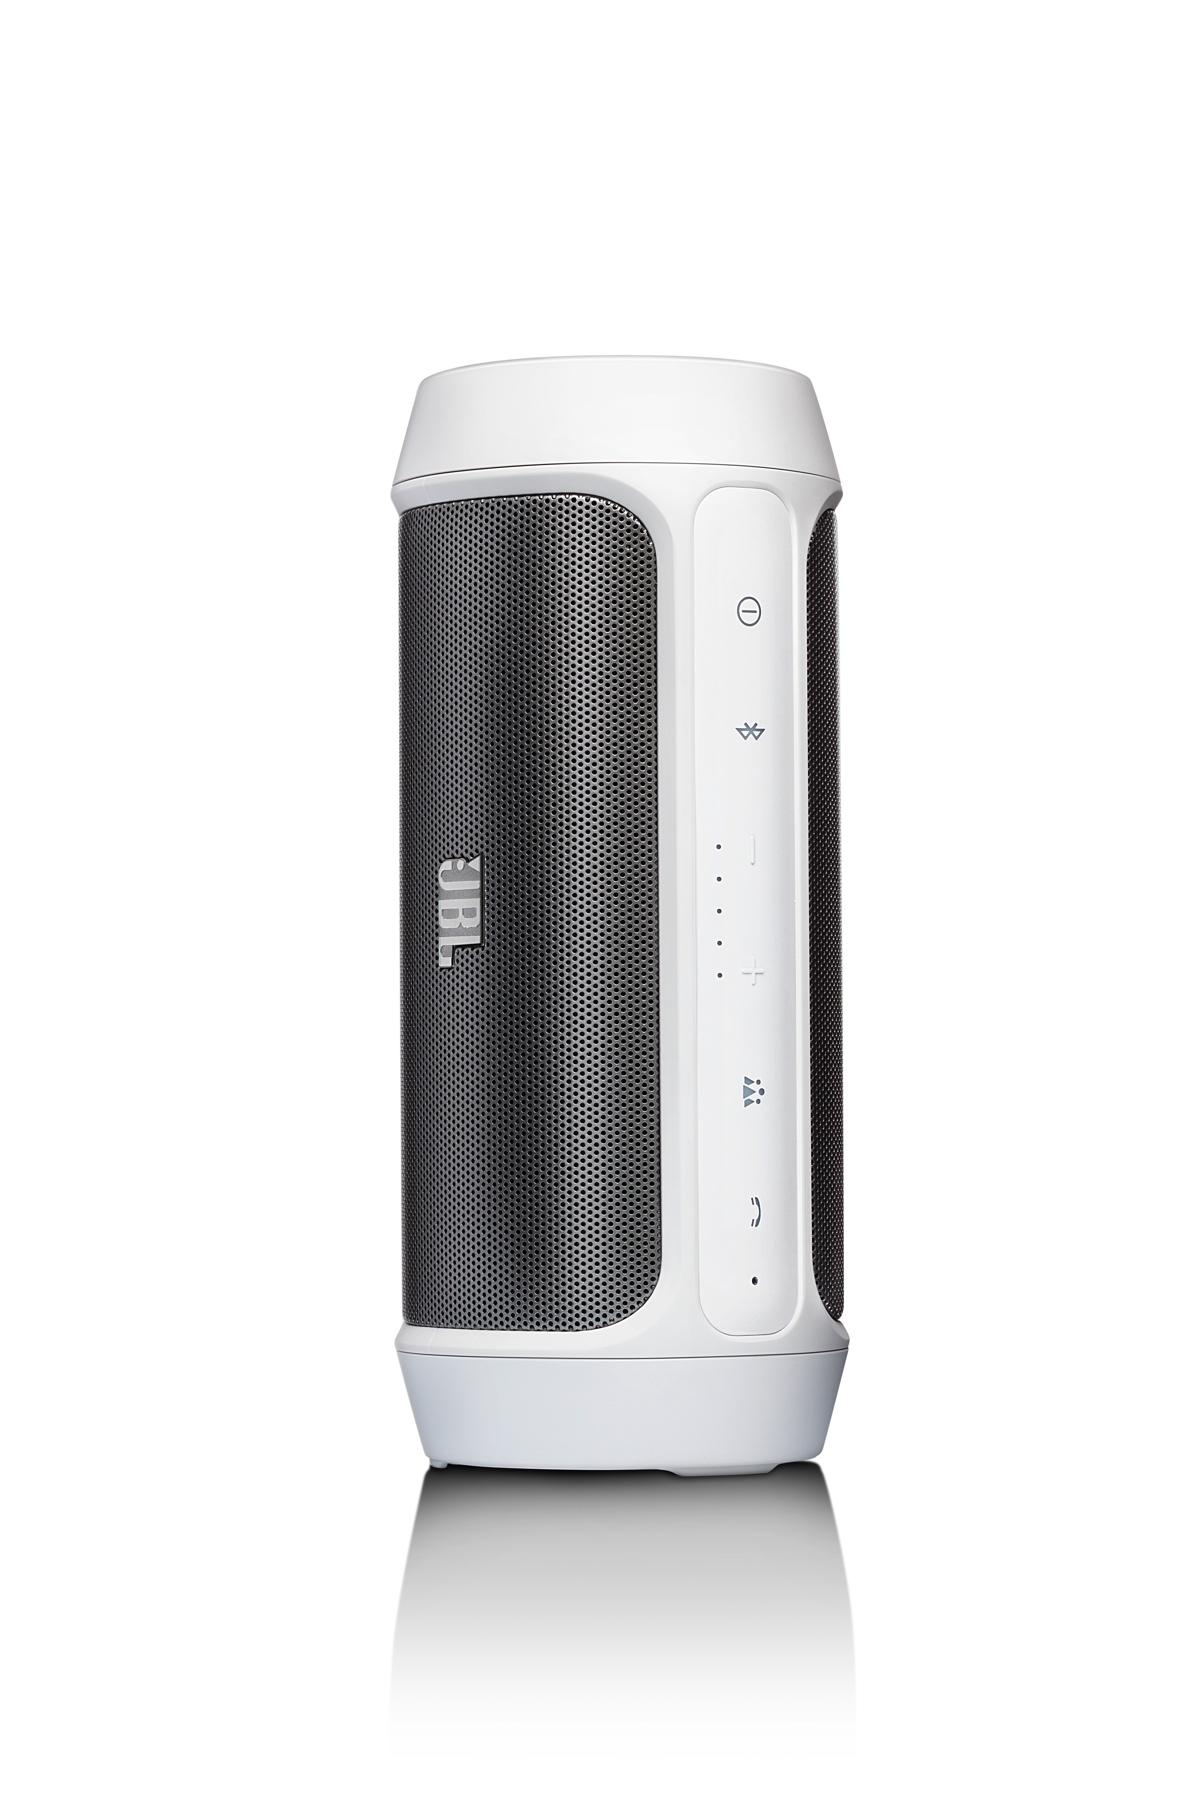 Jbl flip 2 wireless bluetooth speaker user guide share for Housse jbl charge 2